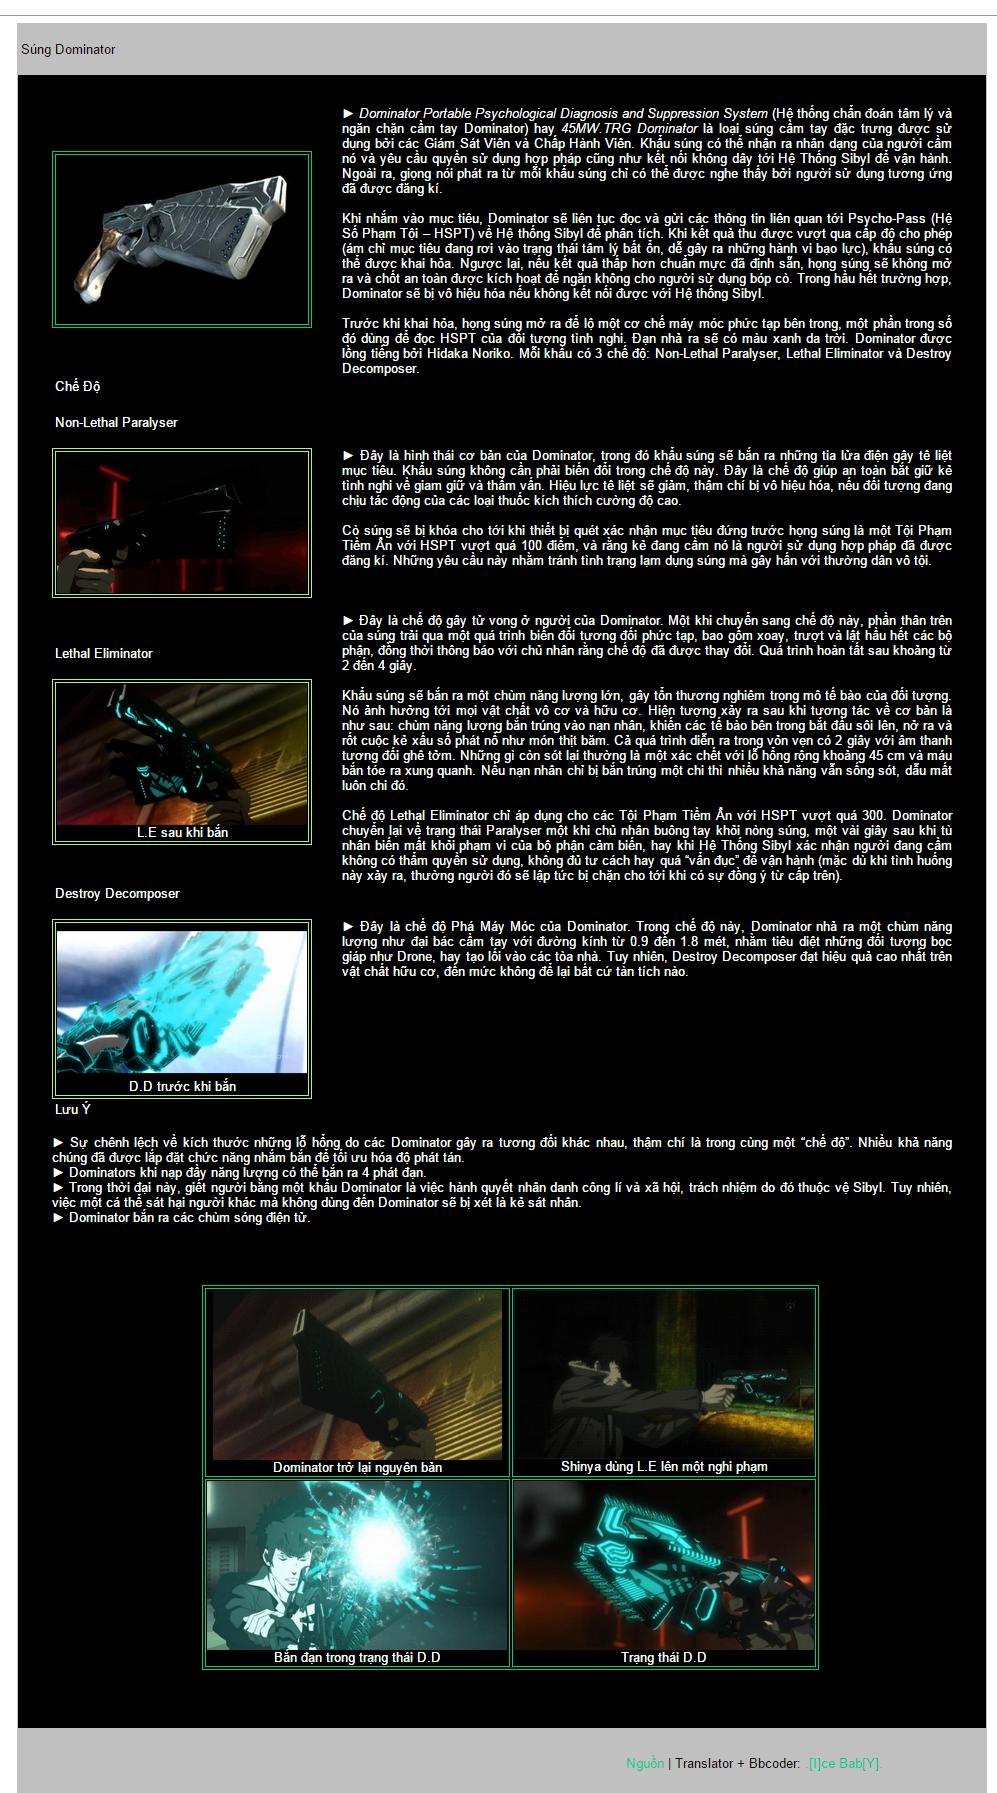 [Psycho Pass] Súng Dominator  15537448480_6e91797c43_o